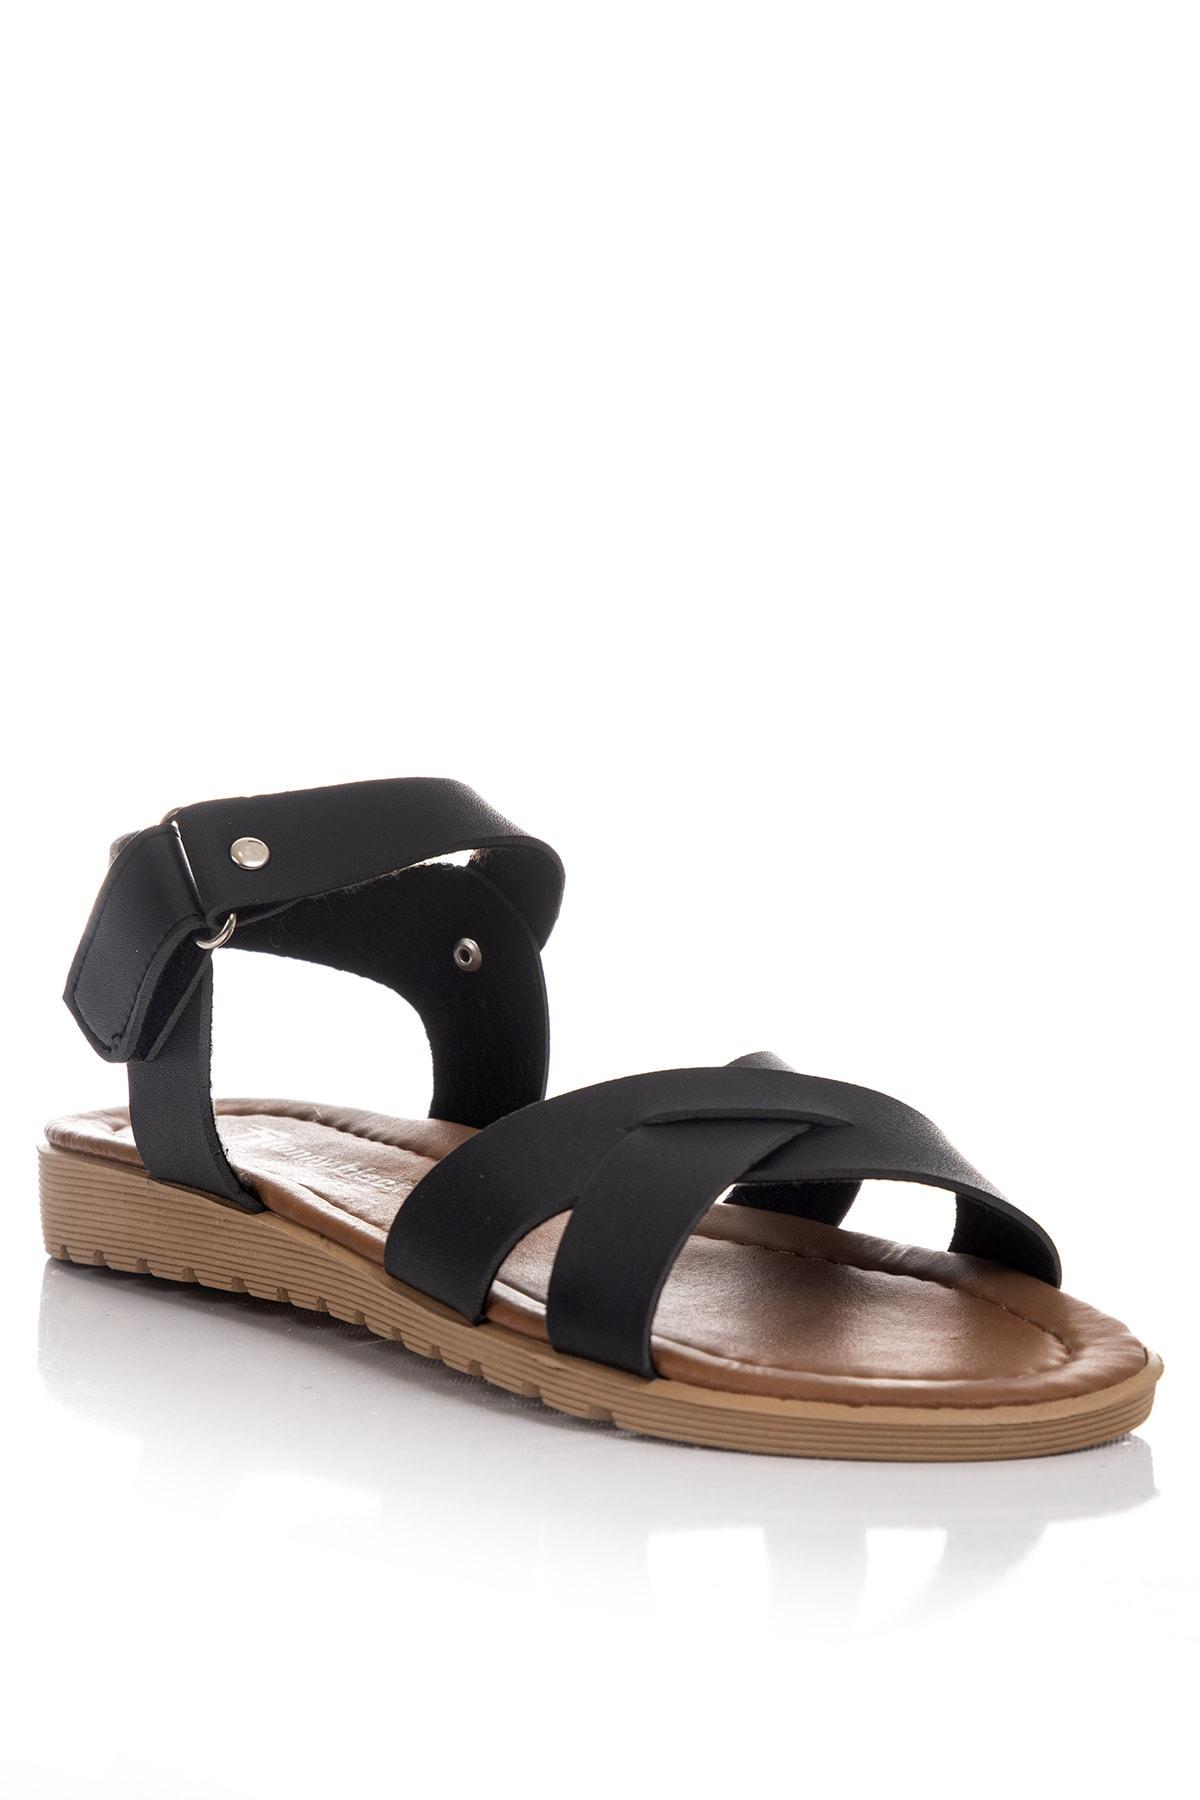 Tonny Black Kadın Sandalet Siyah Tbsnd 2